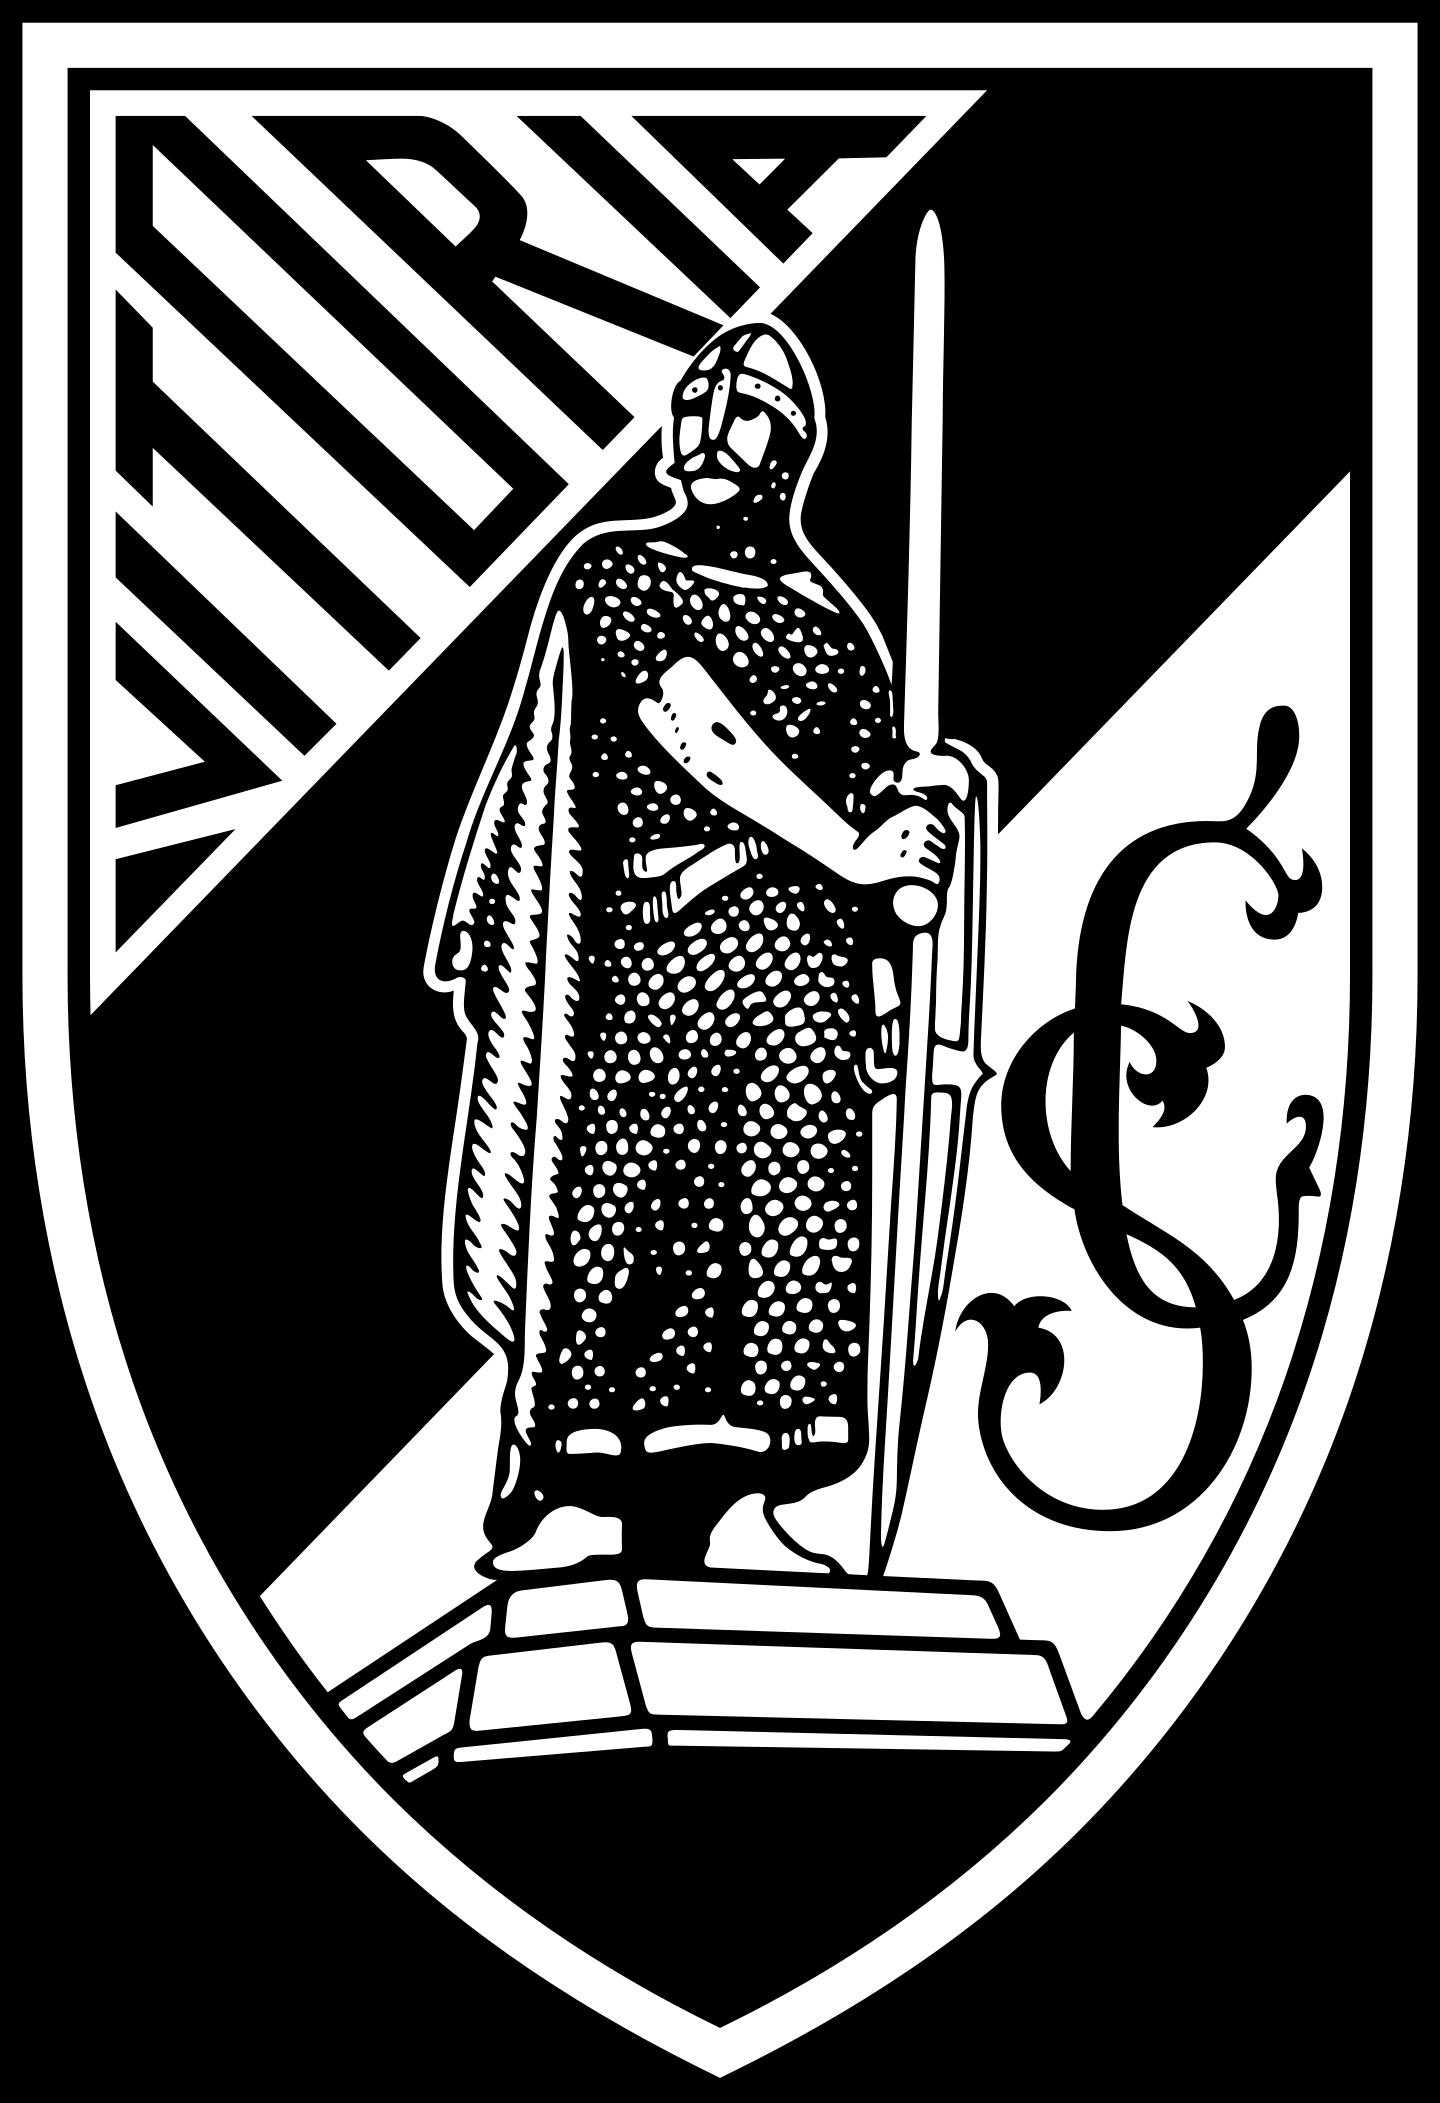 vitoria sport club logo 2 - Vitória Sport Clube Logo